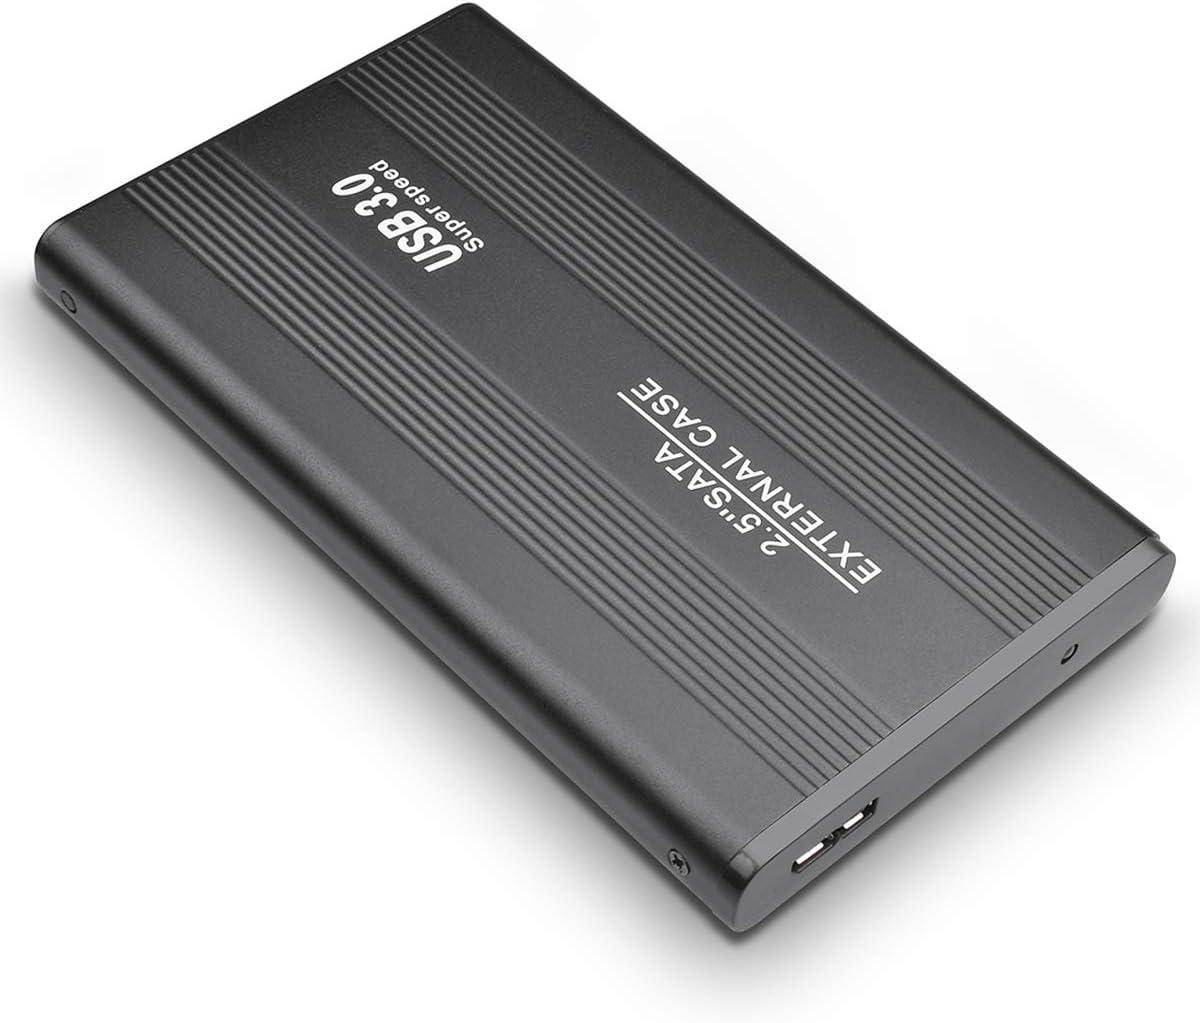 MacBook Chromebook Disco Duro Externo USB3.0 para PC 1TB,Negro Mac,Xbox Disco Duro Externo 1 TB